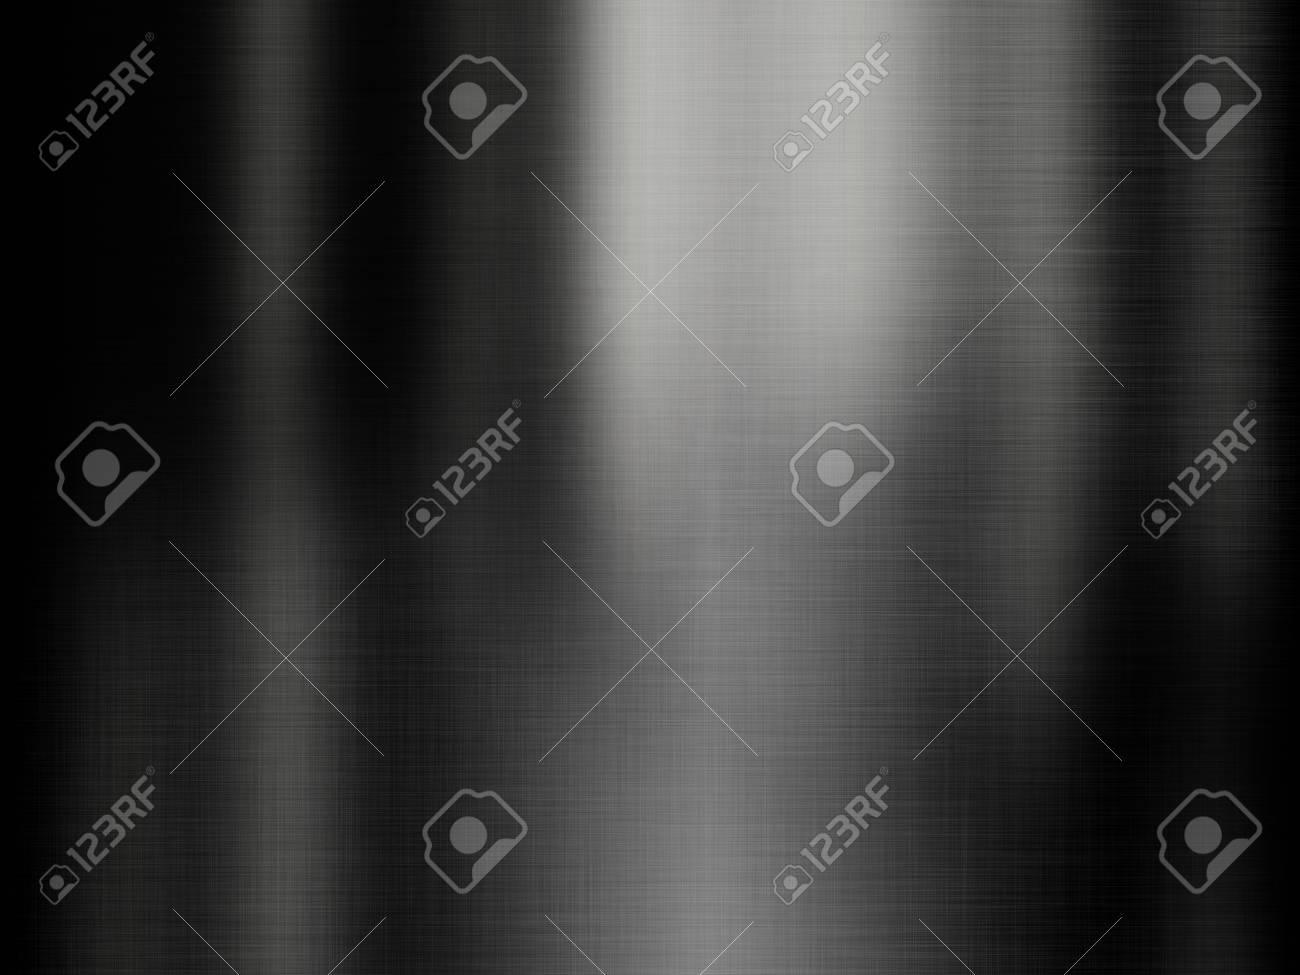 texture en acier inoxydable ou en métal texture de fond Banque d'images - 75076761